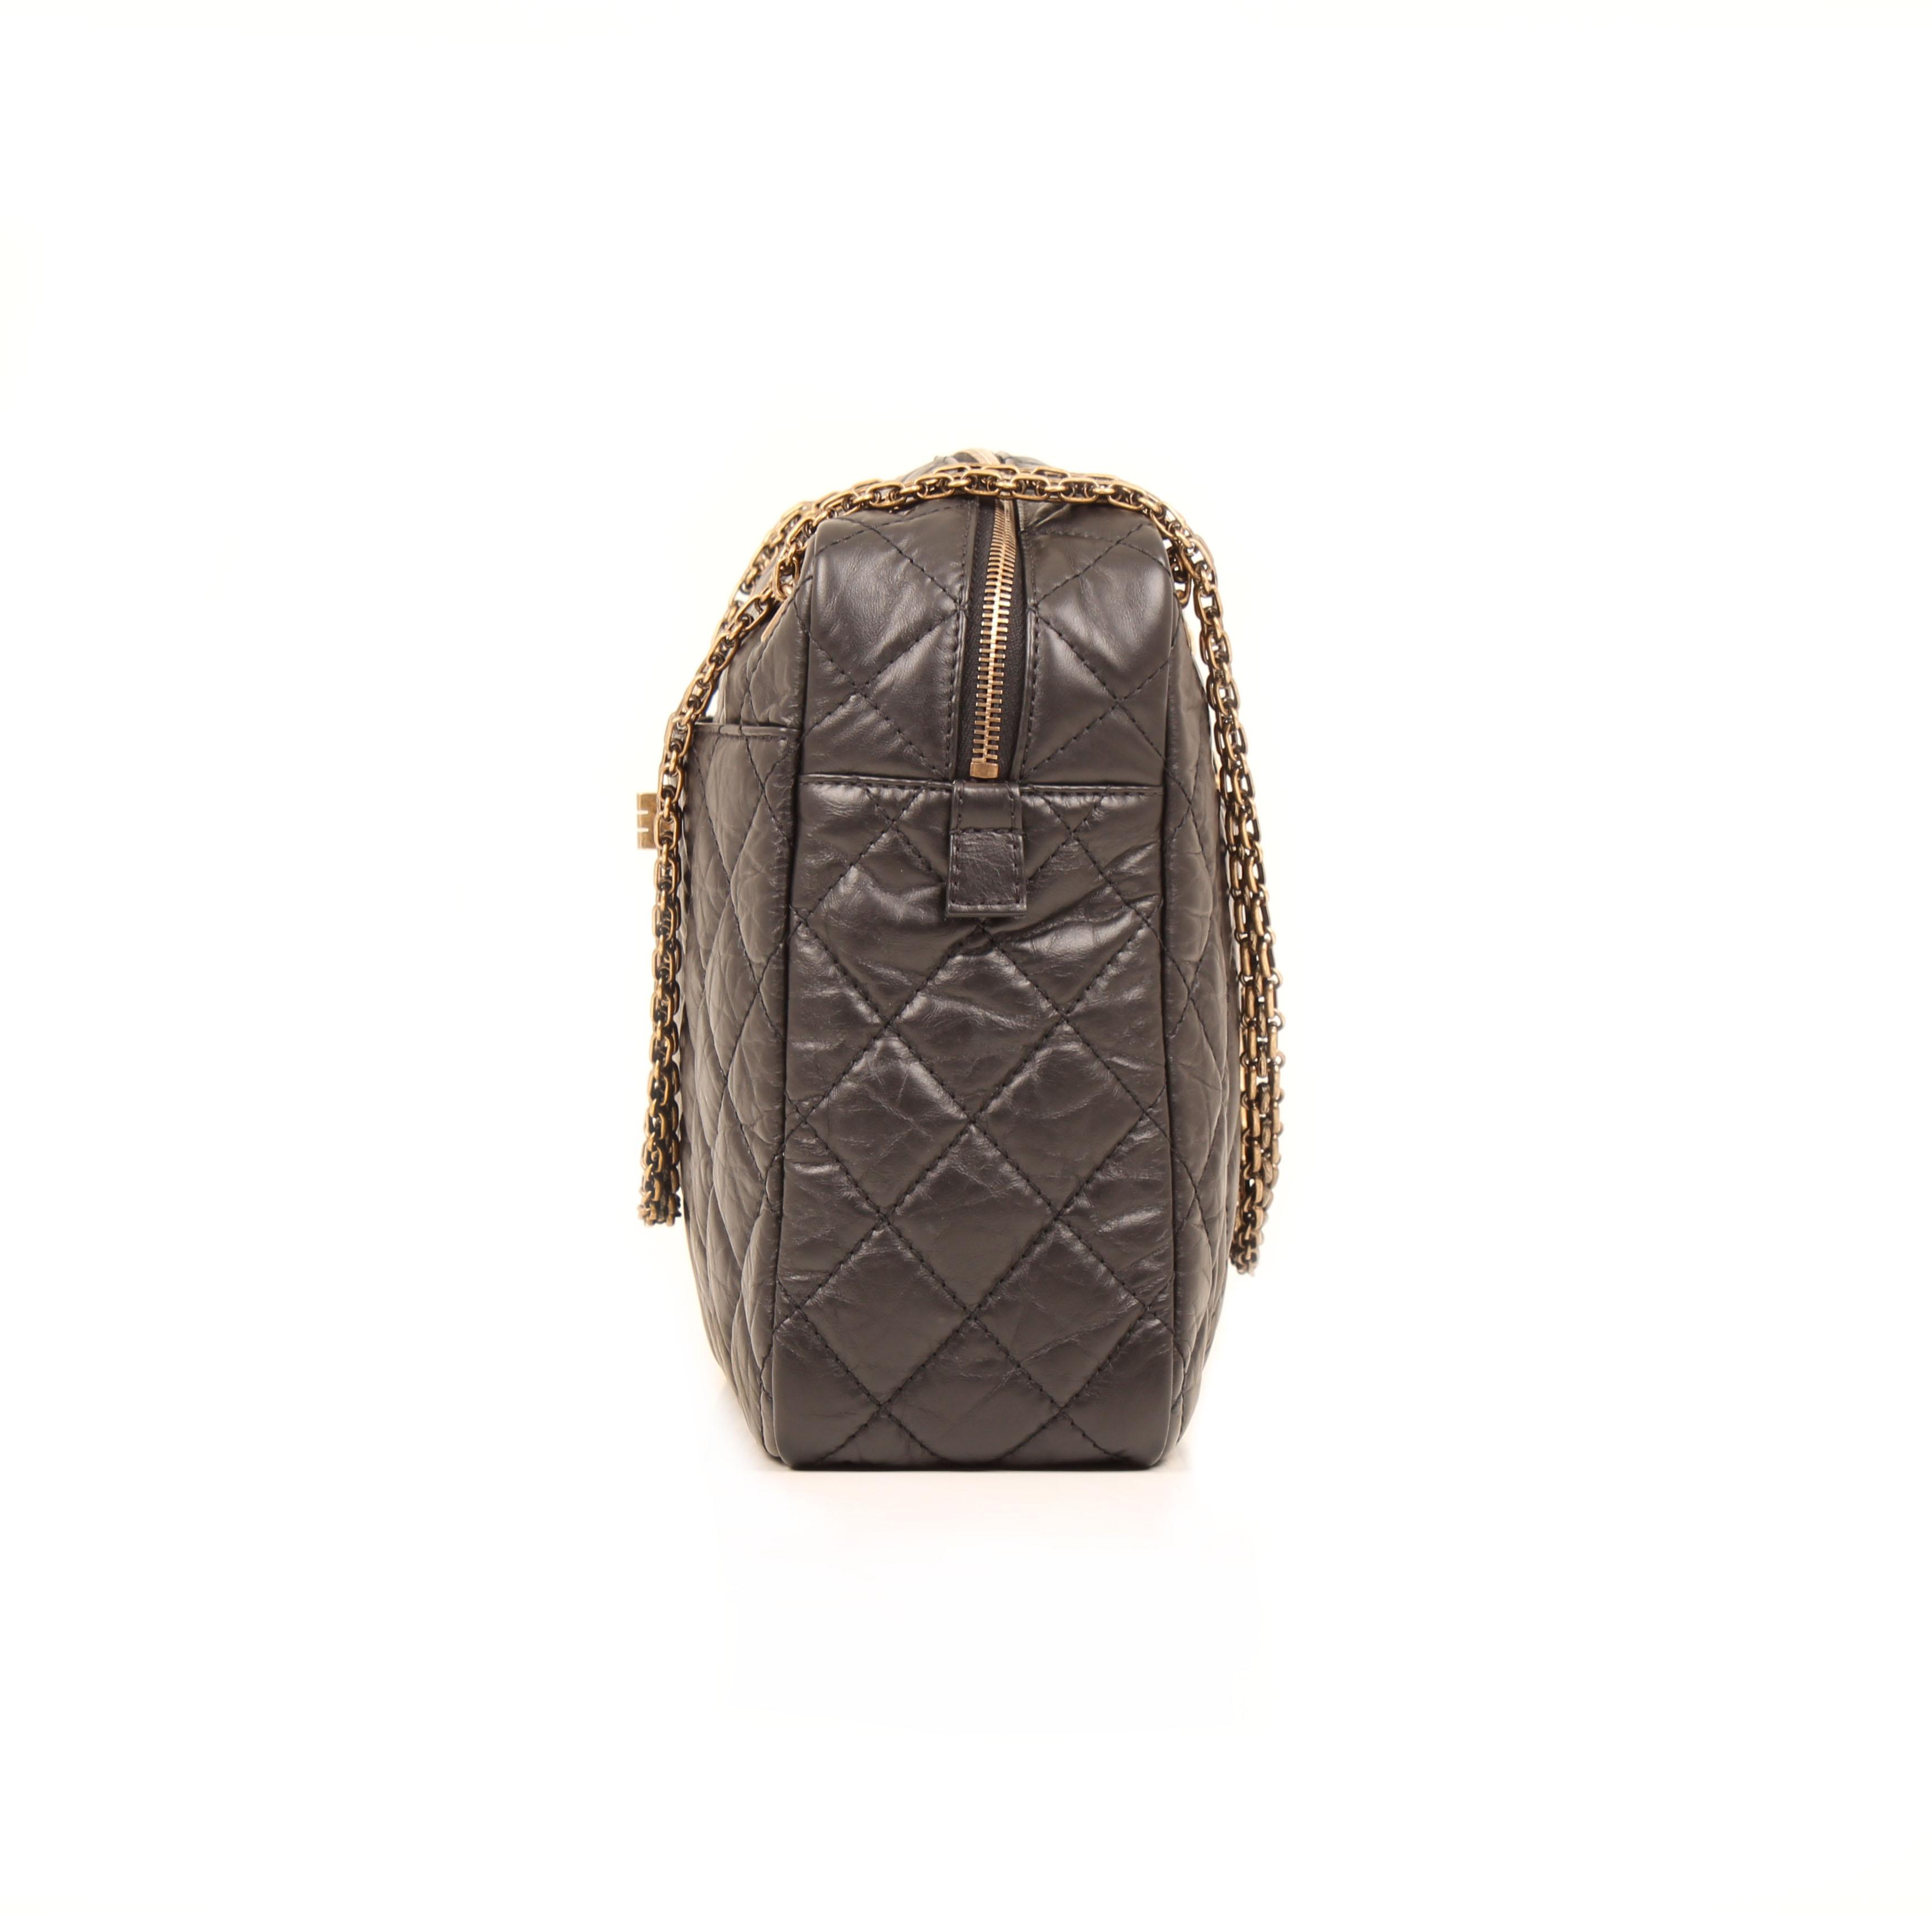 Imagen lateral del bolso chanel camera jumbo reissue piel envejecida negro